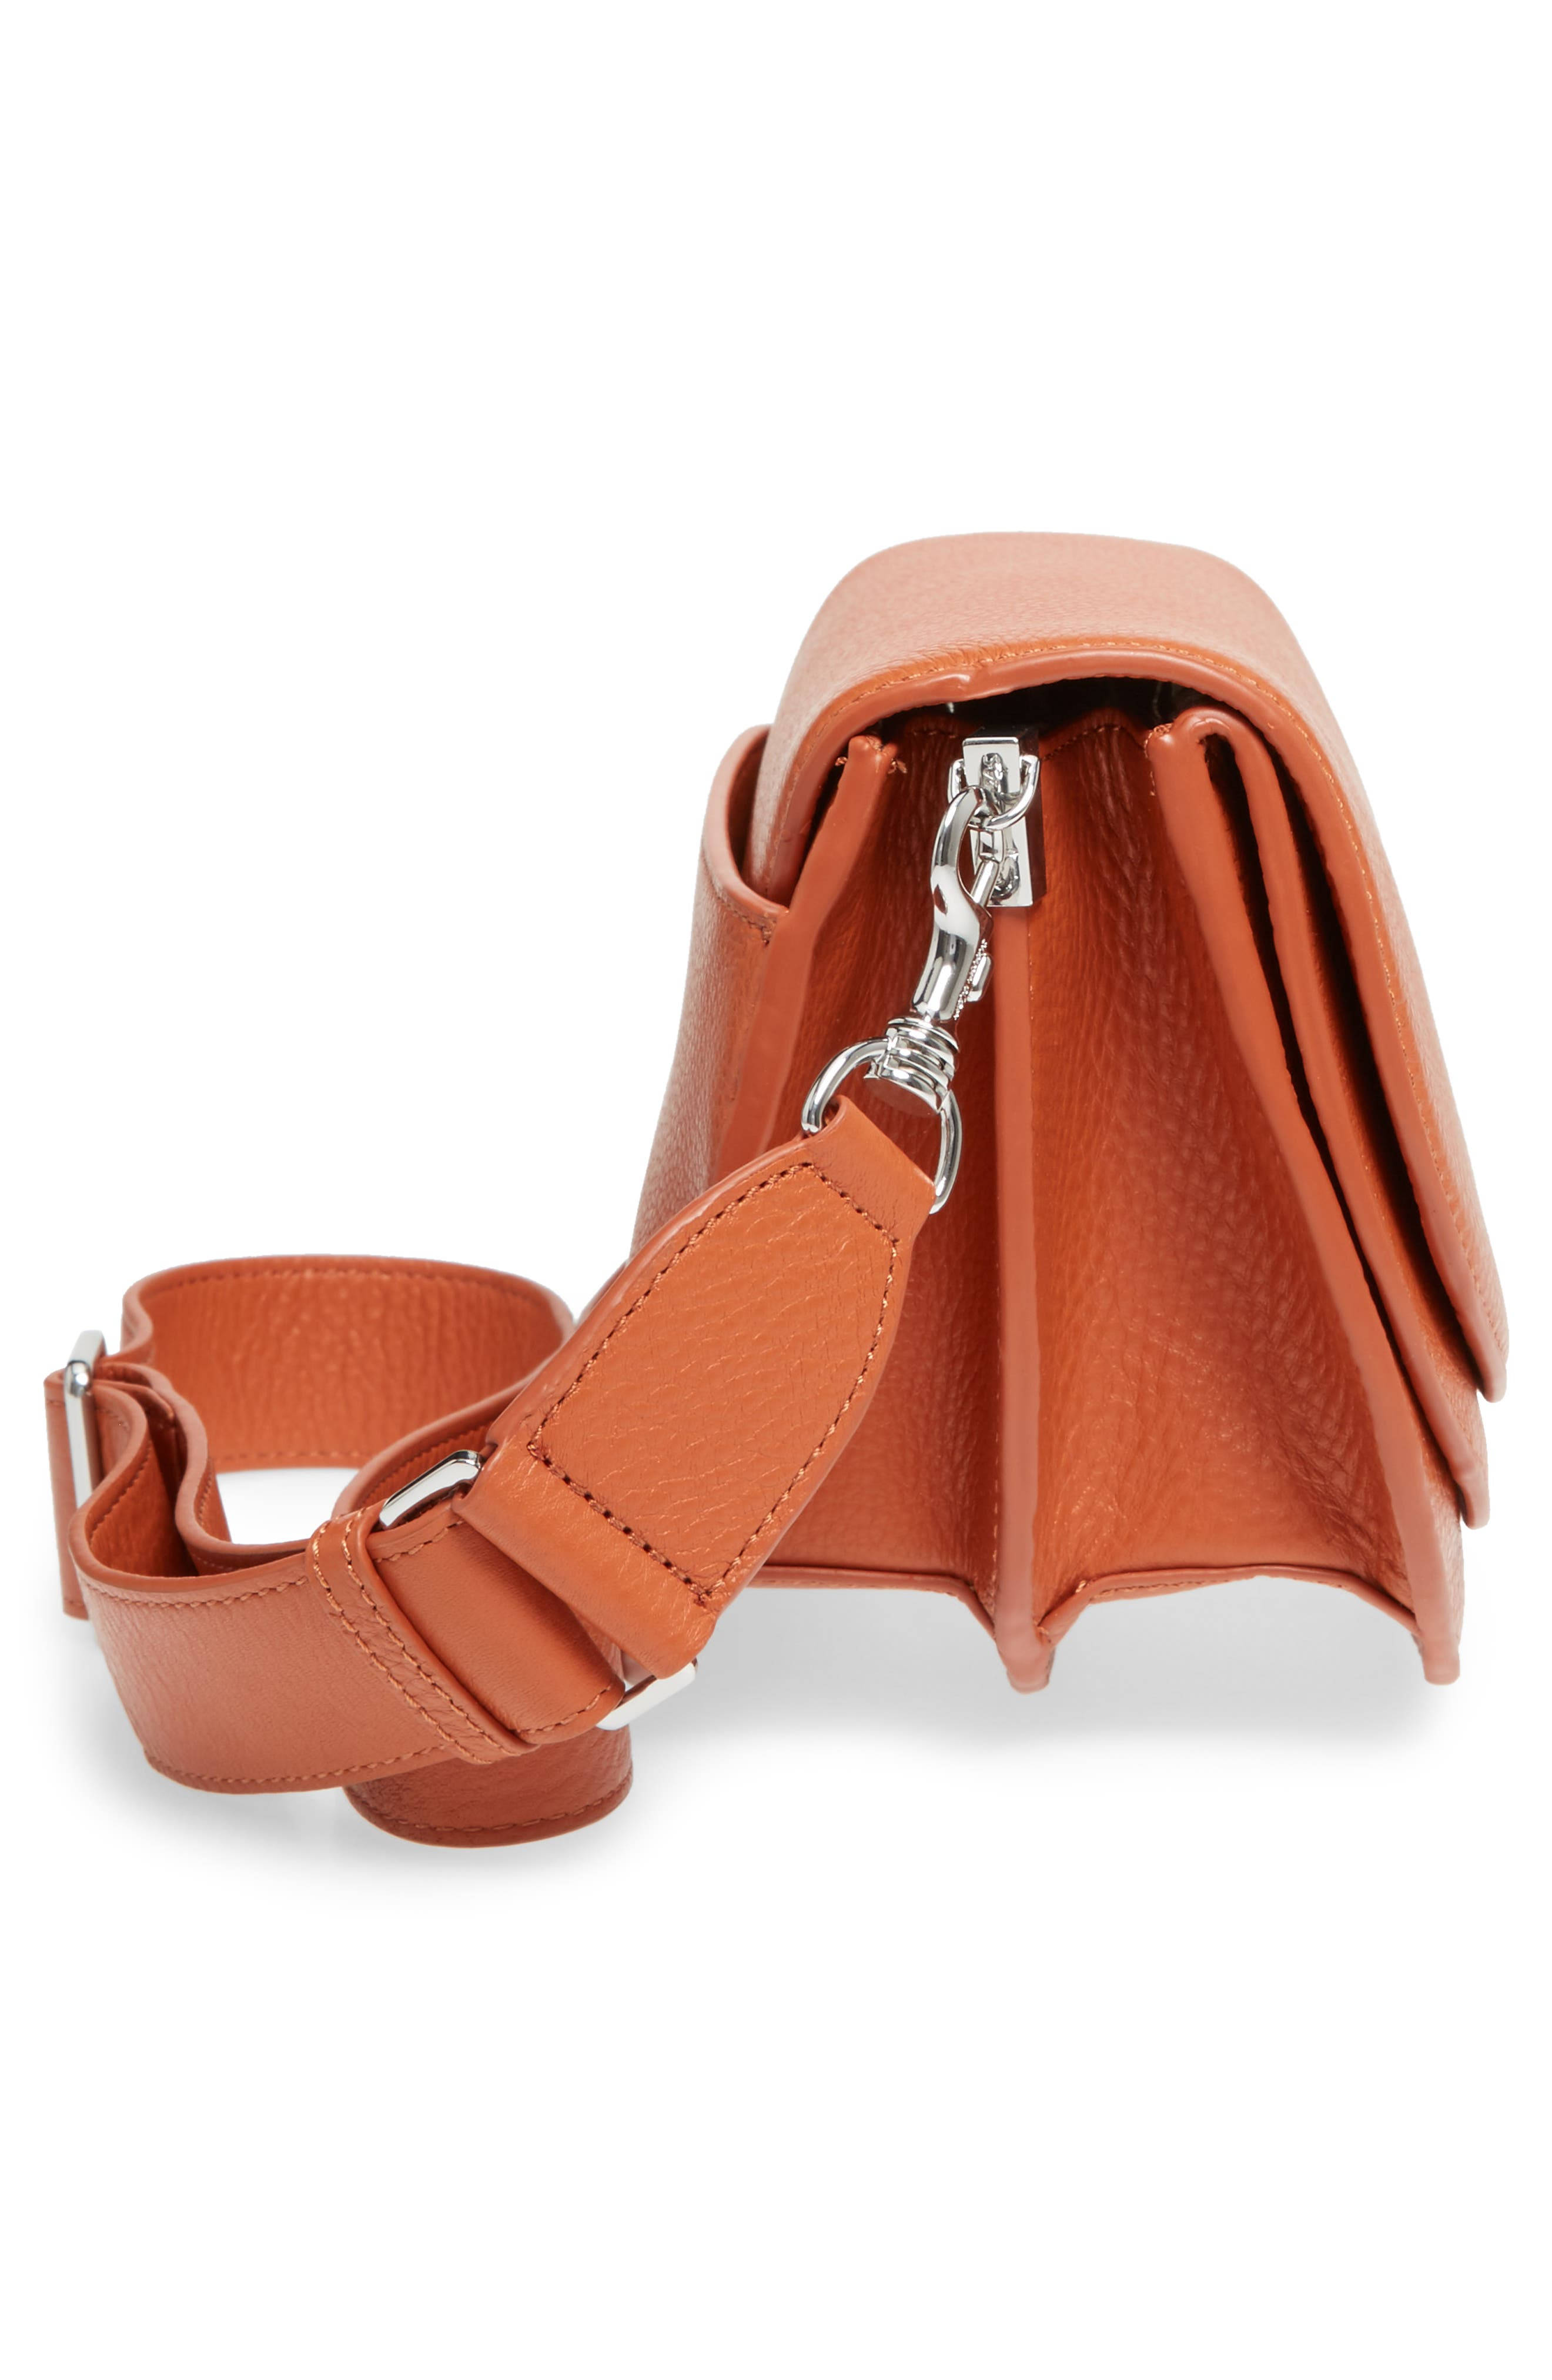 Landon Leather Crossbody Saddle Bag,                             Alternate thumbnail 20, color,